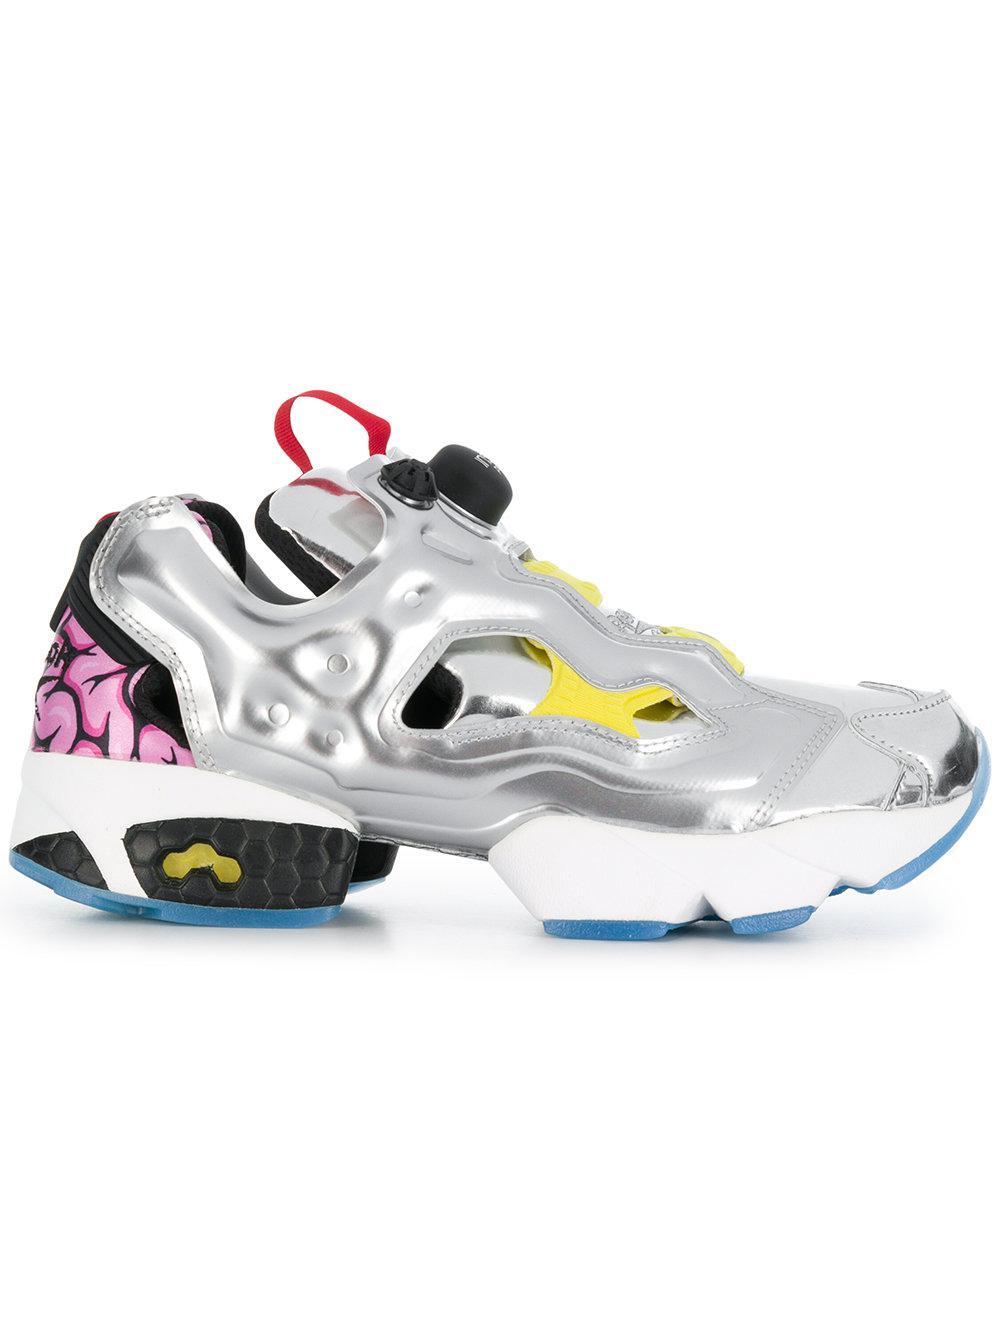 b38a1ec2de3 Lyst - Reebok Instapump Fury Og Vp Sneakers in Metallic